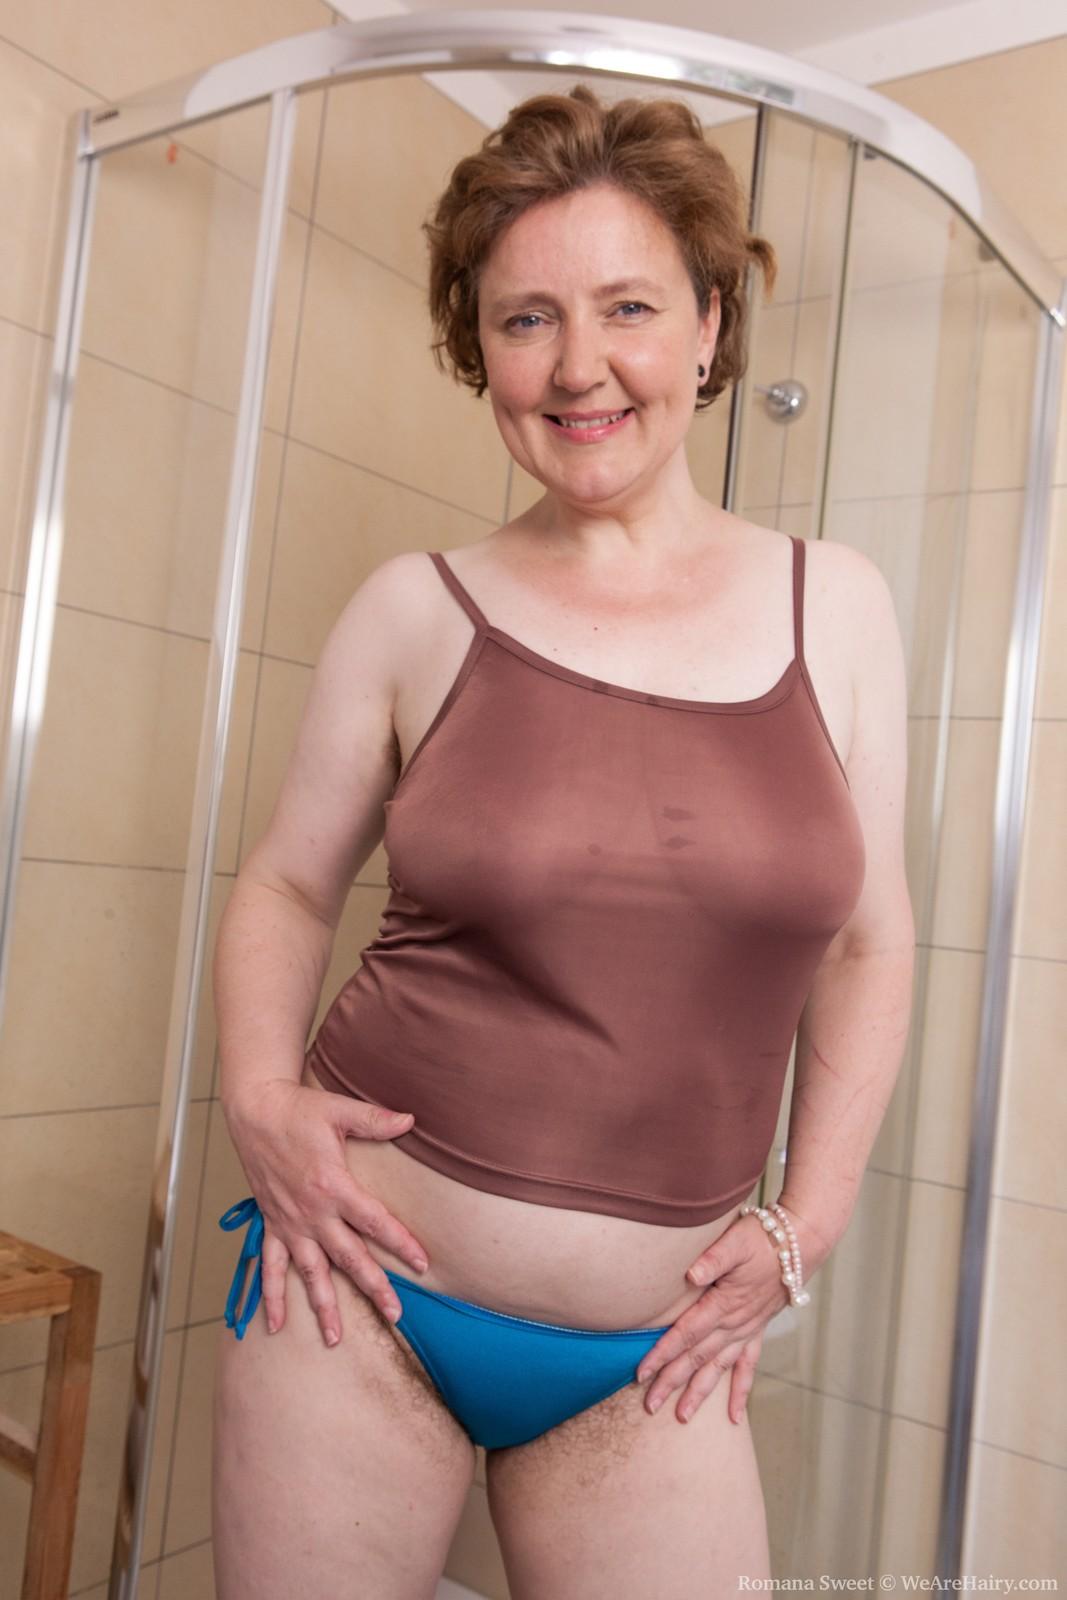 Romana Sweet wants to wash her bushy labia and showcase her sweet figure